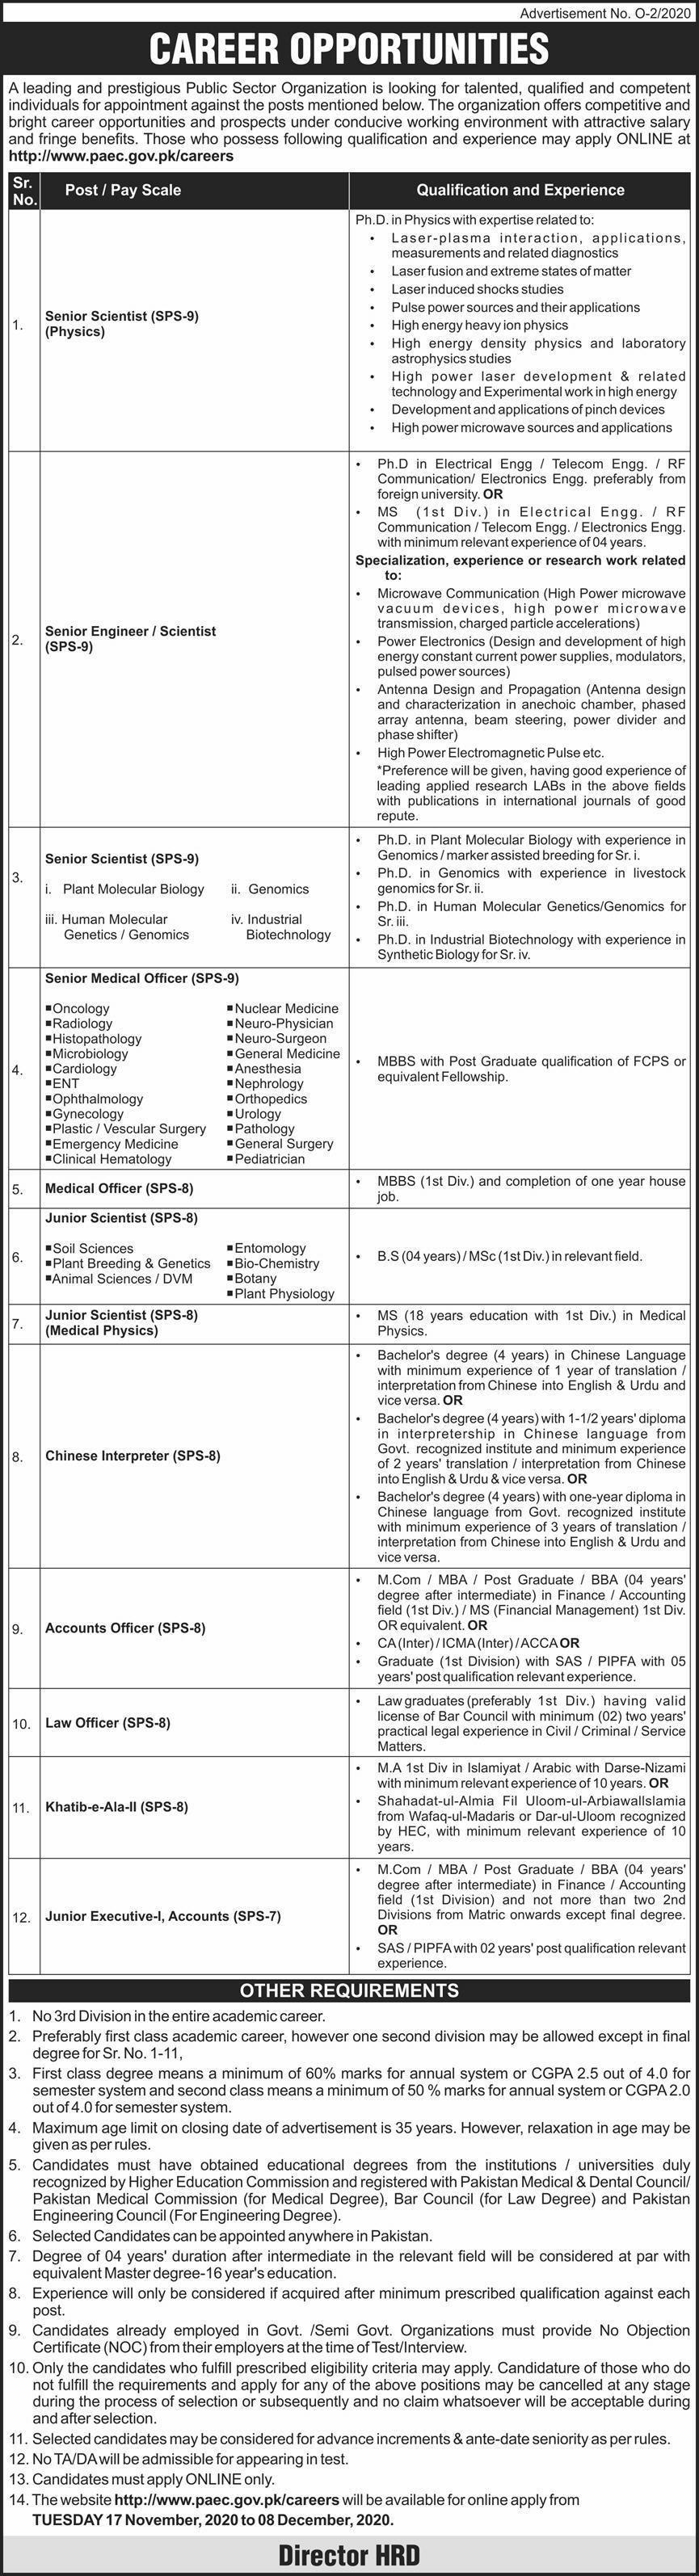 Jobs in Public Sector Organization 2020 Apply Online